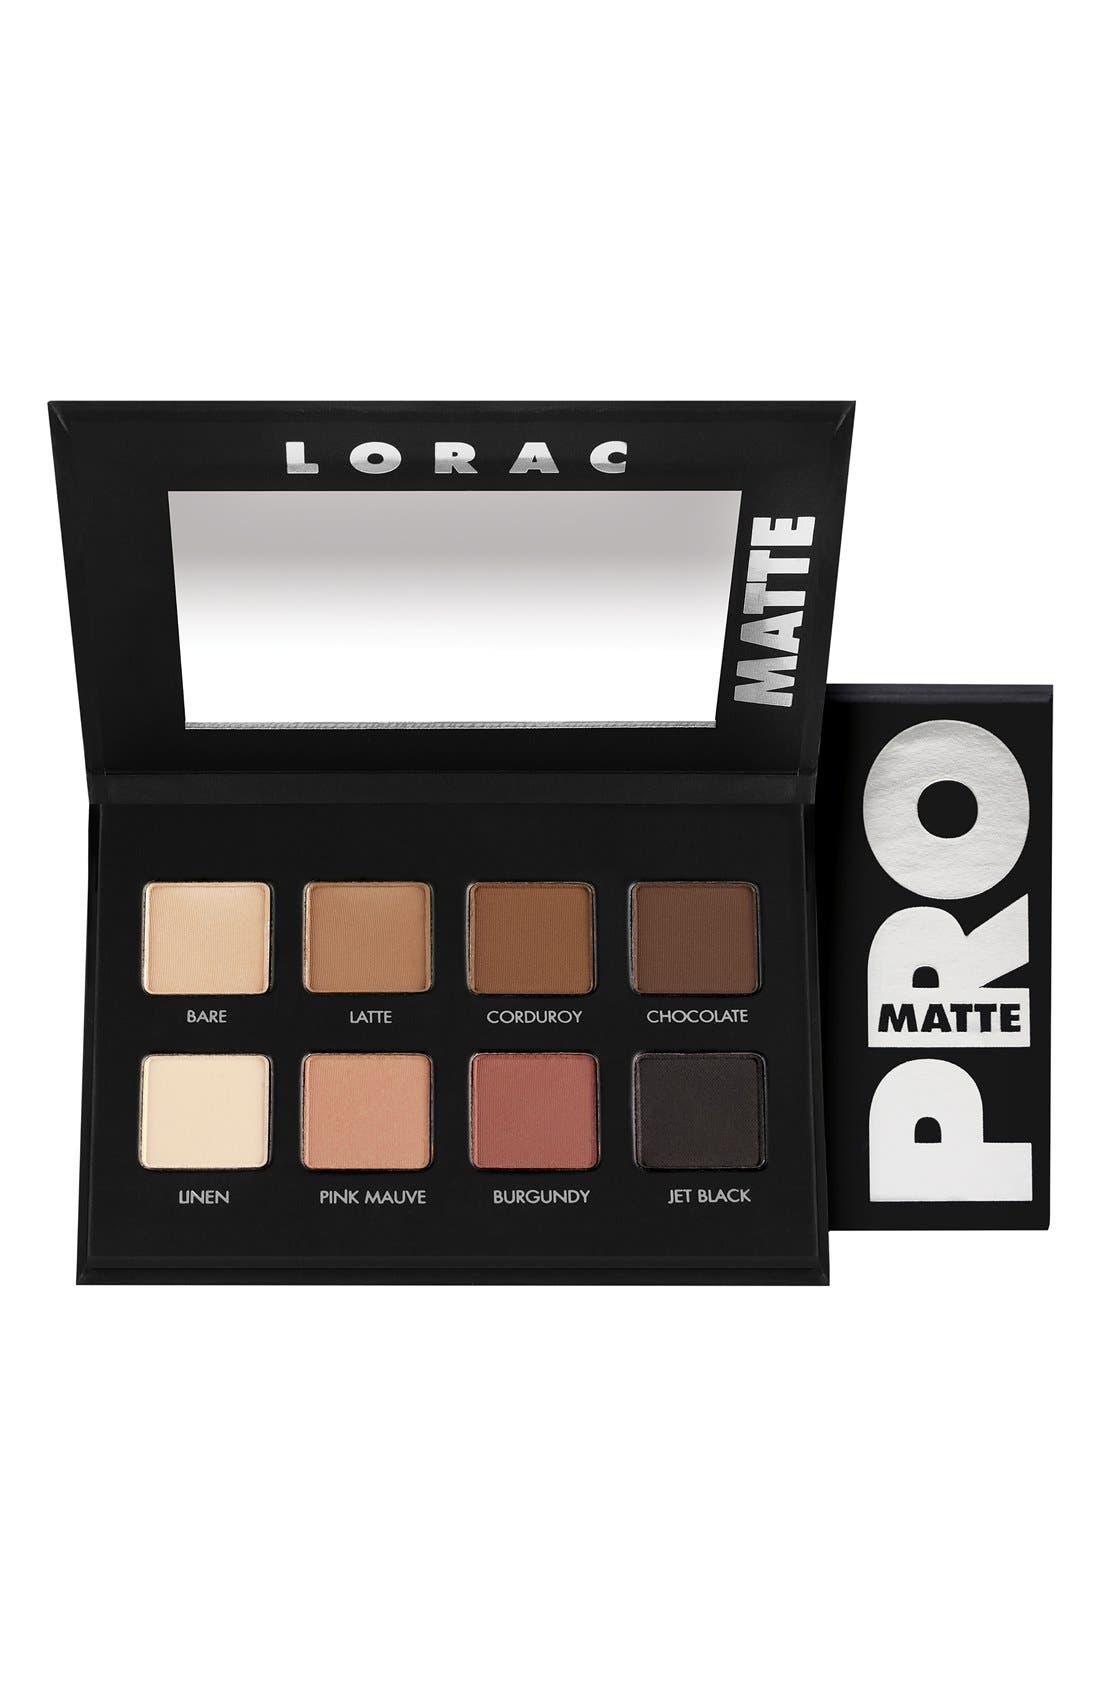 LORAC, 'PRO' Matte Eyeshadow Palette, Main thumbnail 1, color, 000